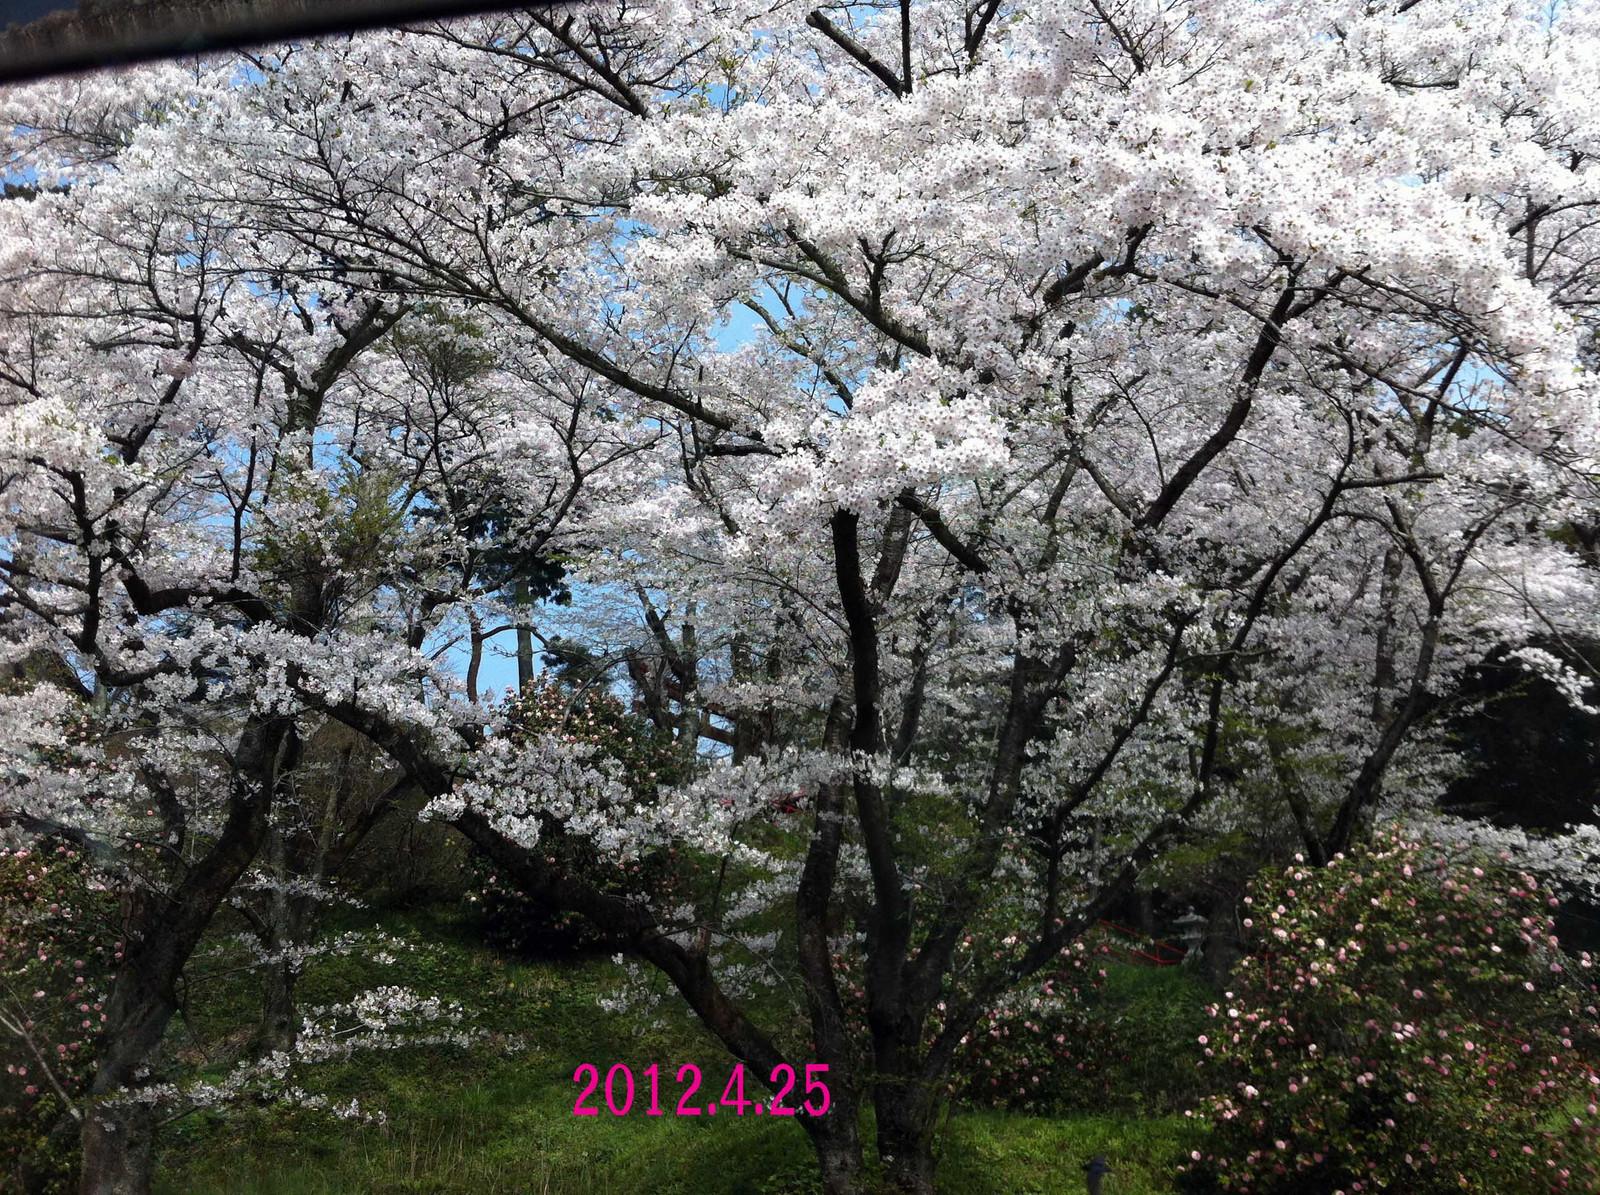 2012_04_25_4051_edited1